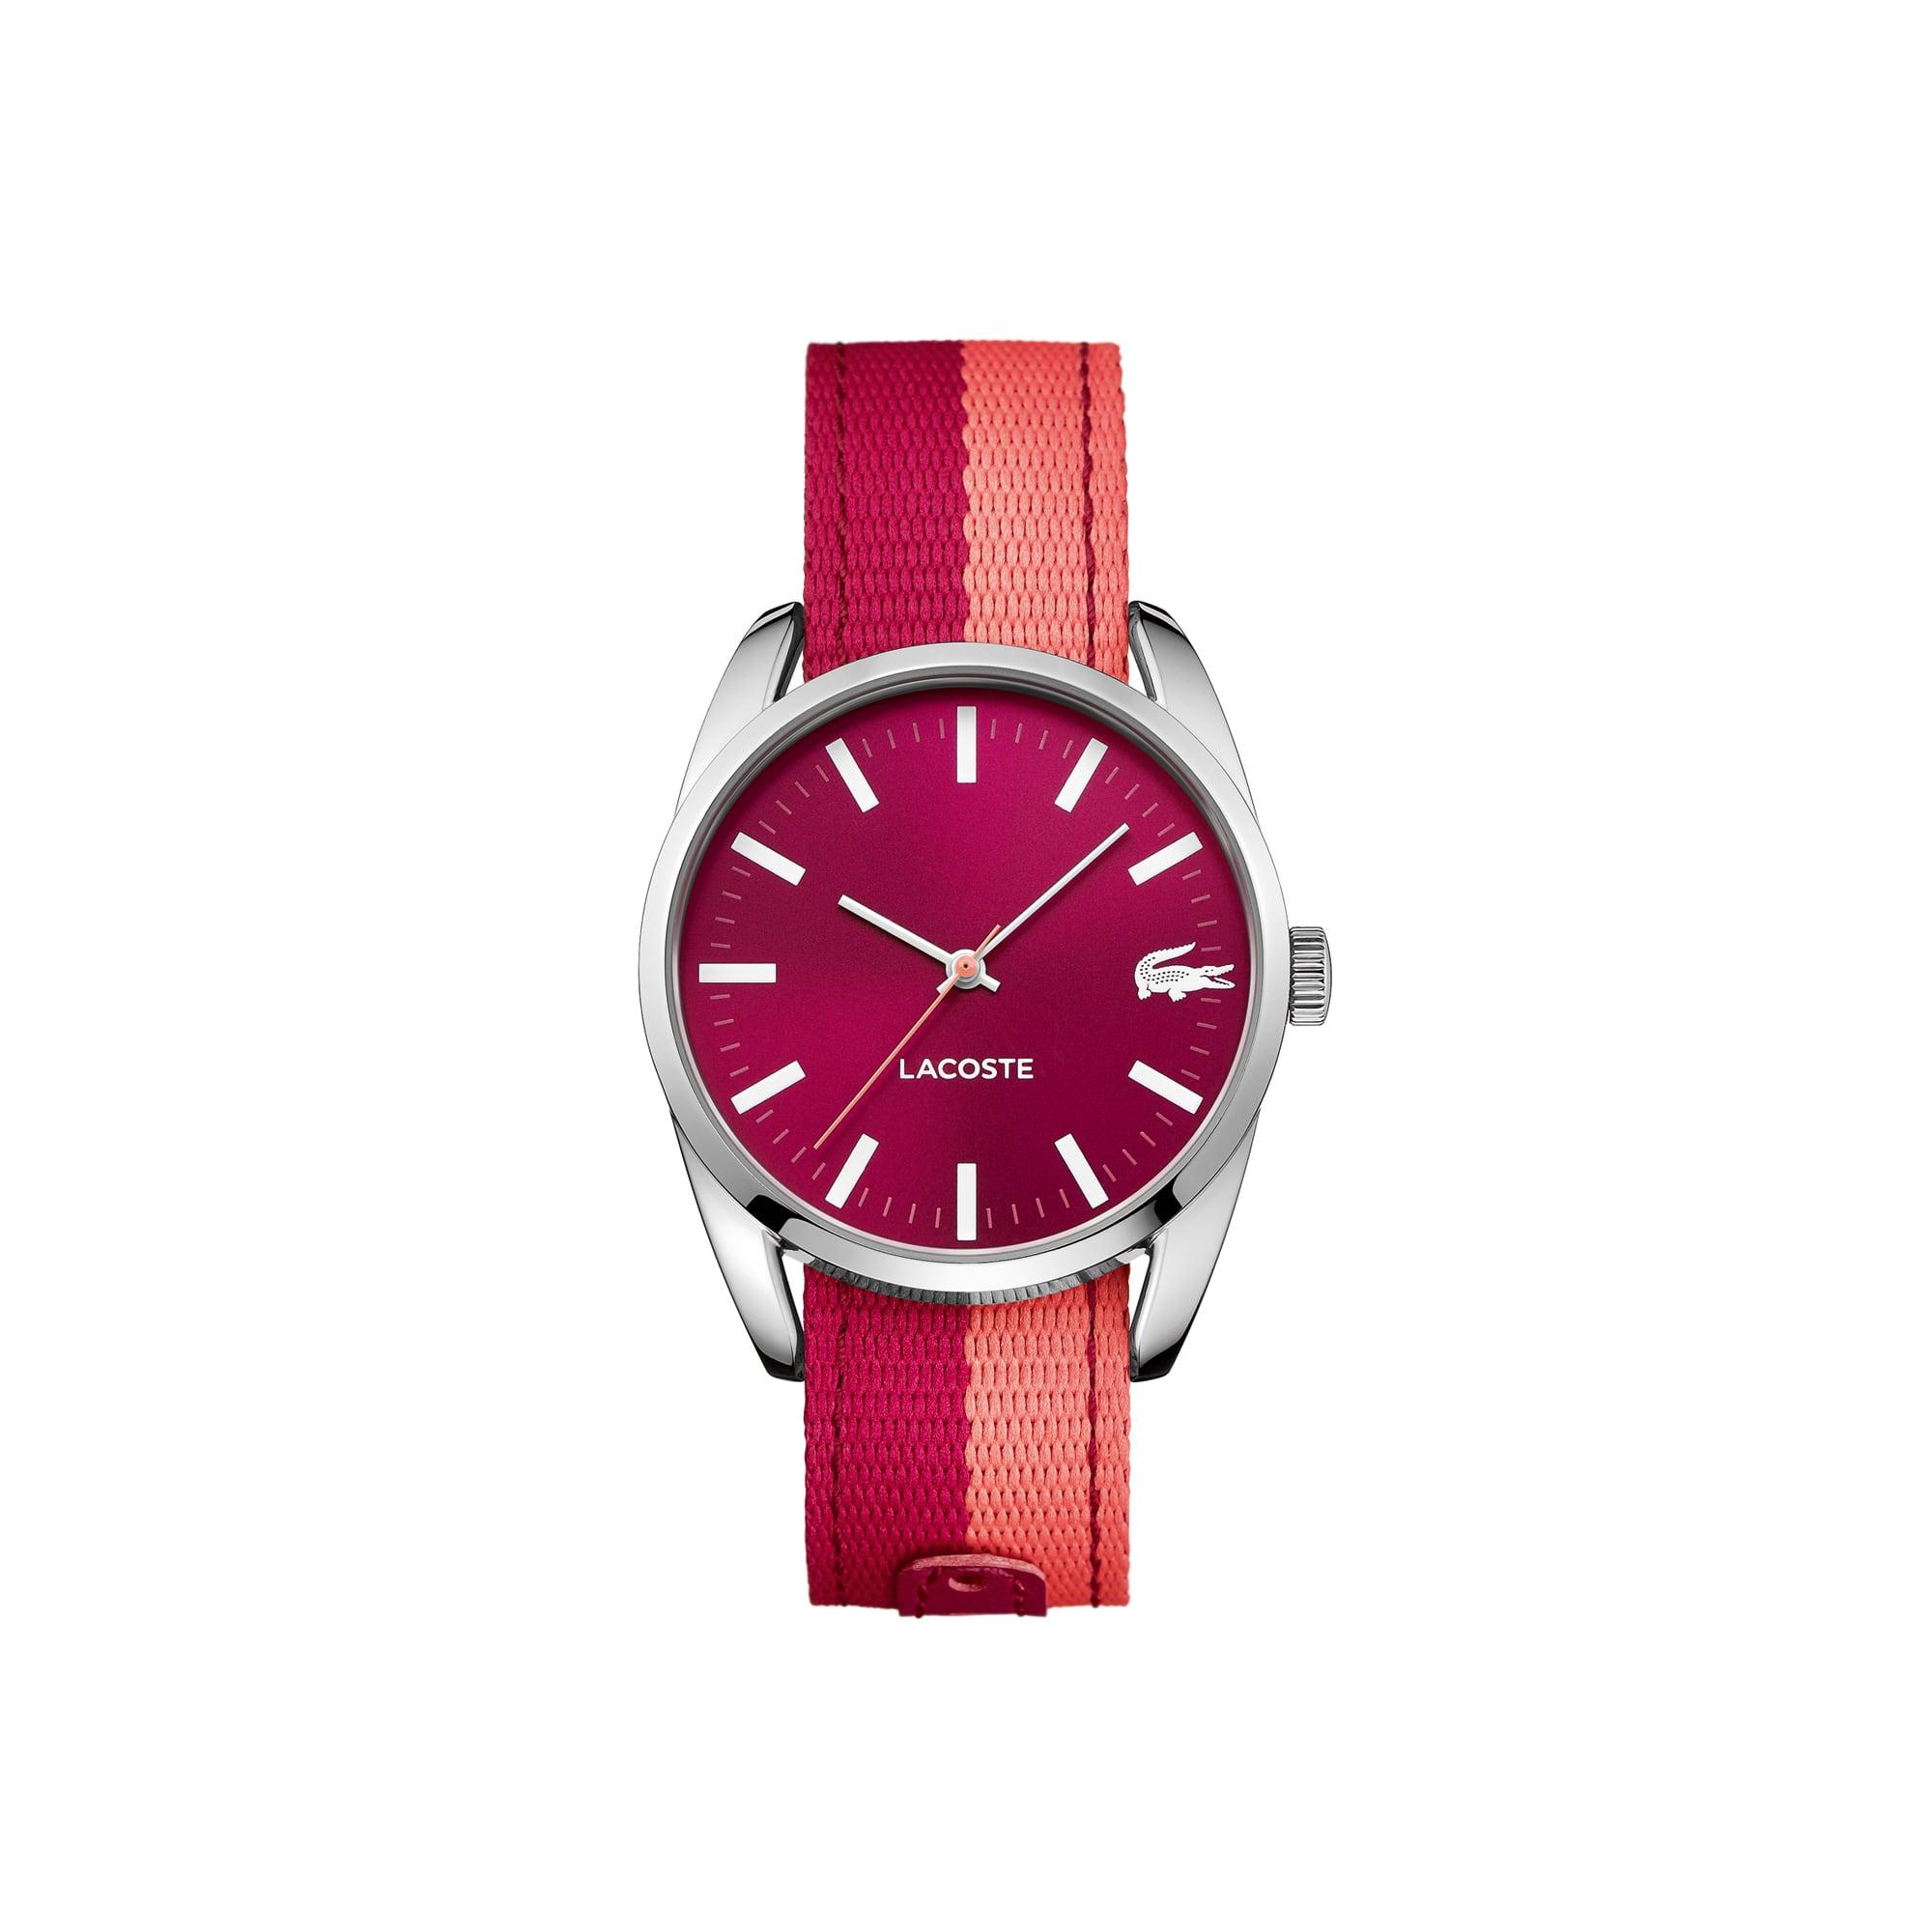 Malaga Watch - pink reversible textile strap